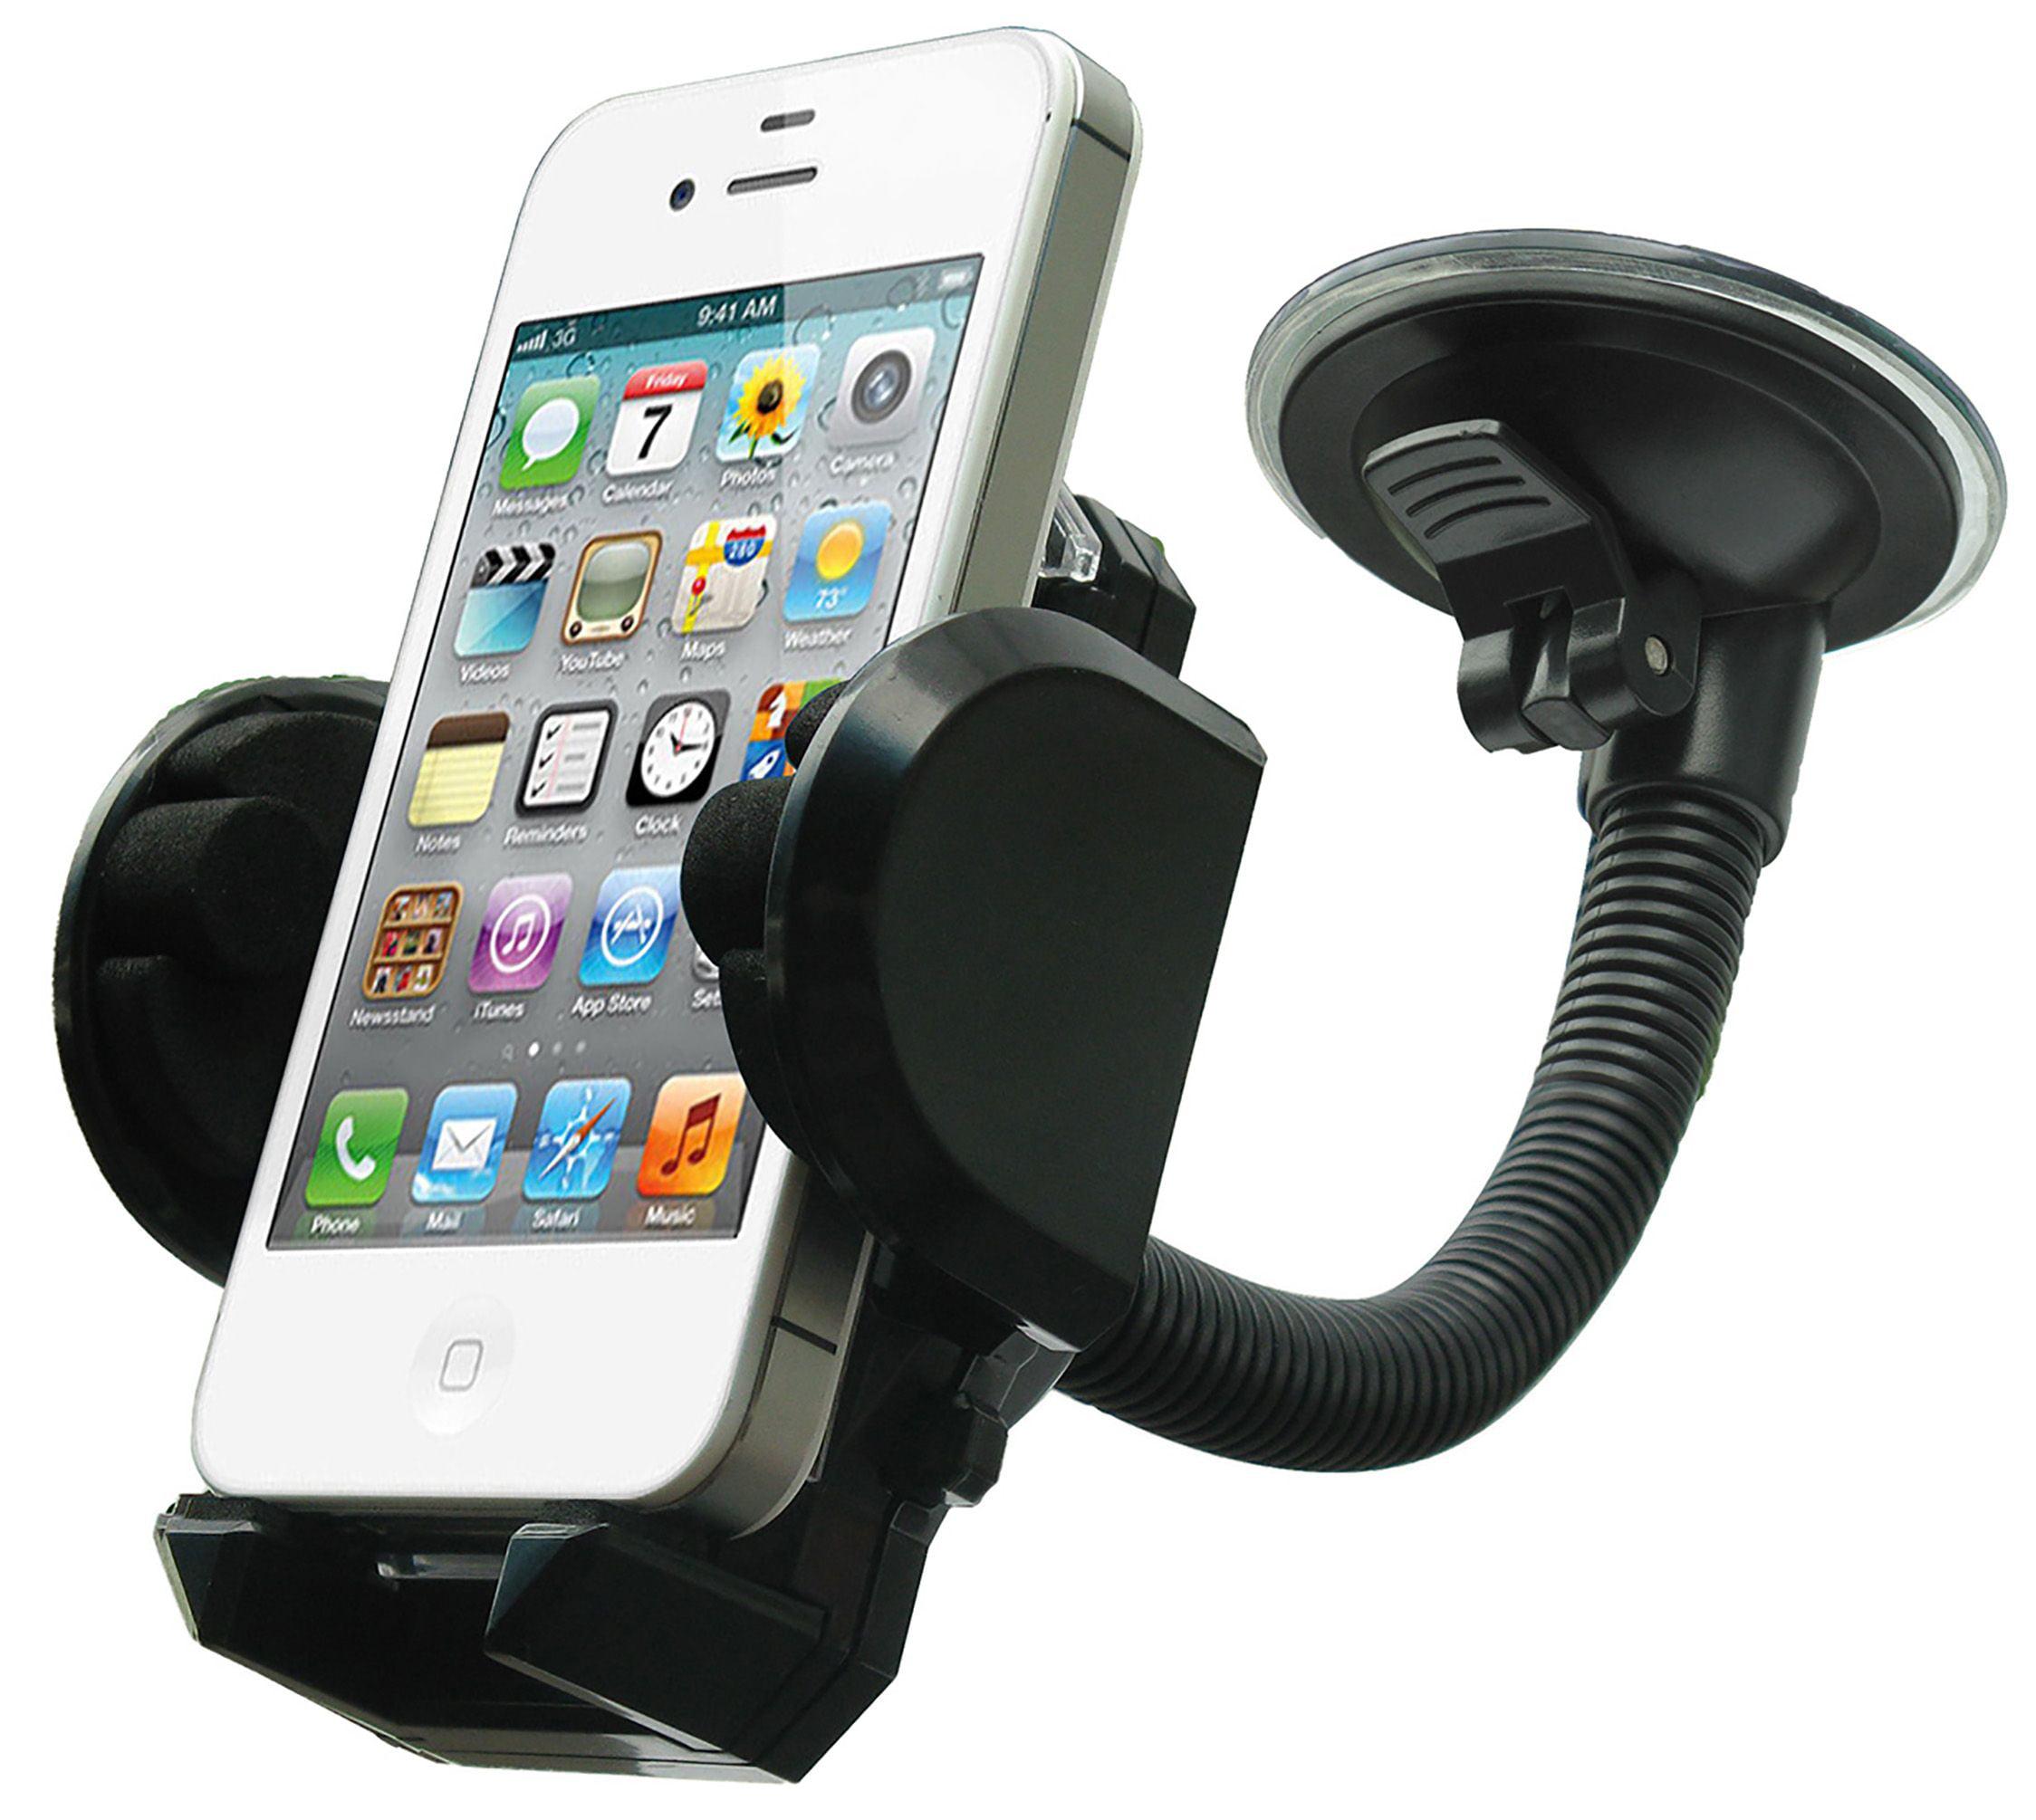 Cell Phone Holder Mobile Phone Car Mount 360 Degree Rotation Windshield Dashboard Cradle For Gps Iphone X 8 7 7plus 6 6plus 5s 5 5c Samsung Galaxy S7 Edge 6s Smartphones Walmart Com Walmart Com